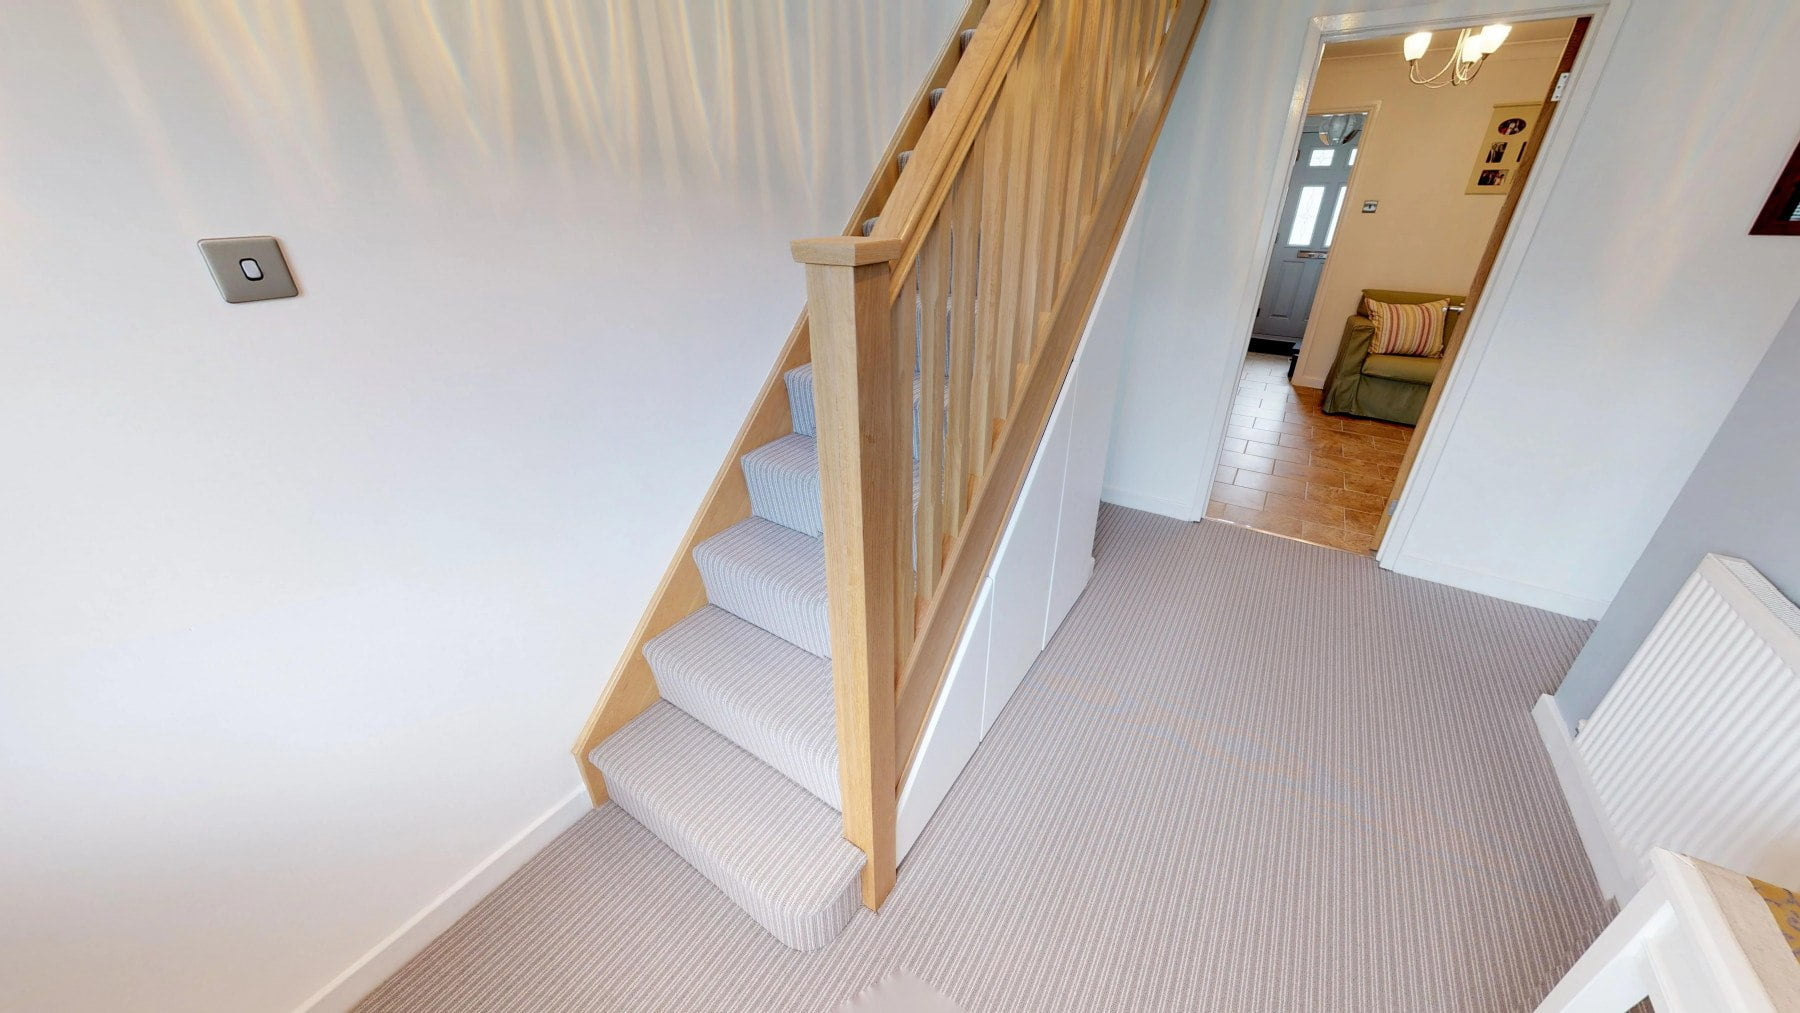 Loft-Pro-Multi-Room-Bungalow-Velux-10022018_164813